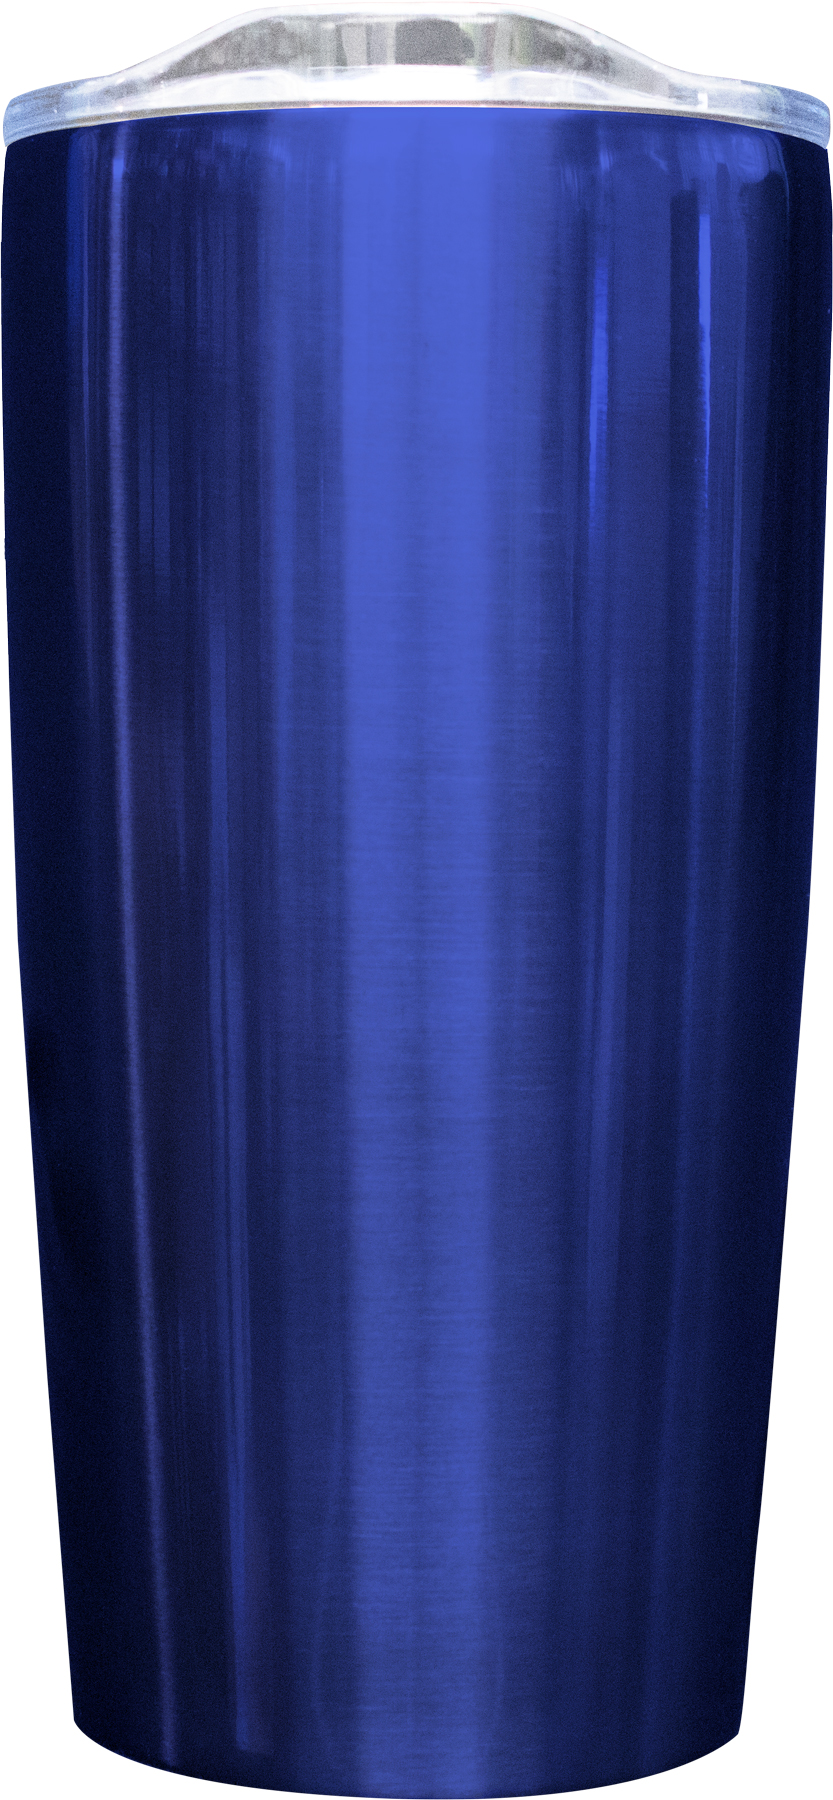 20oz Tumbler Blank - Blue